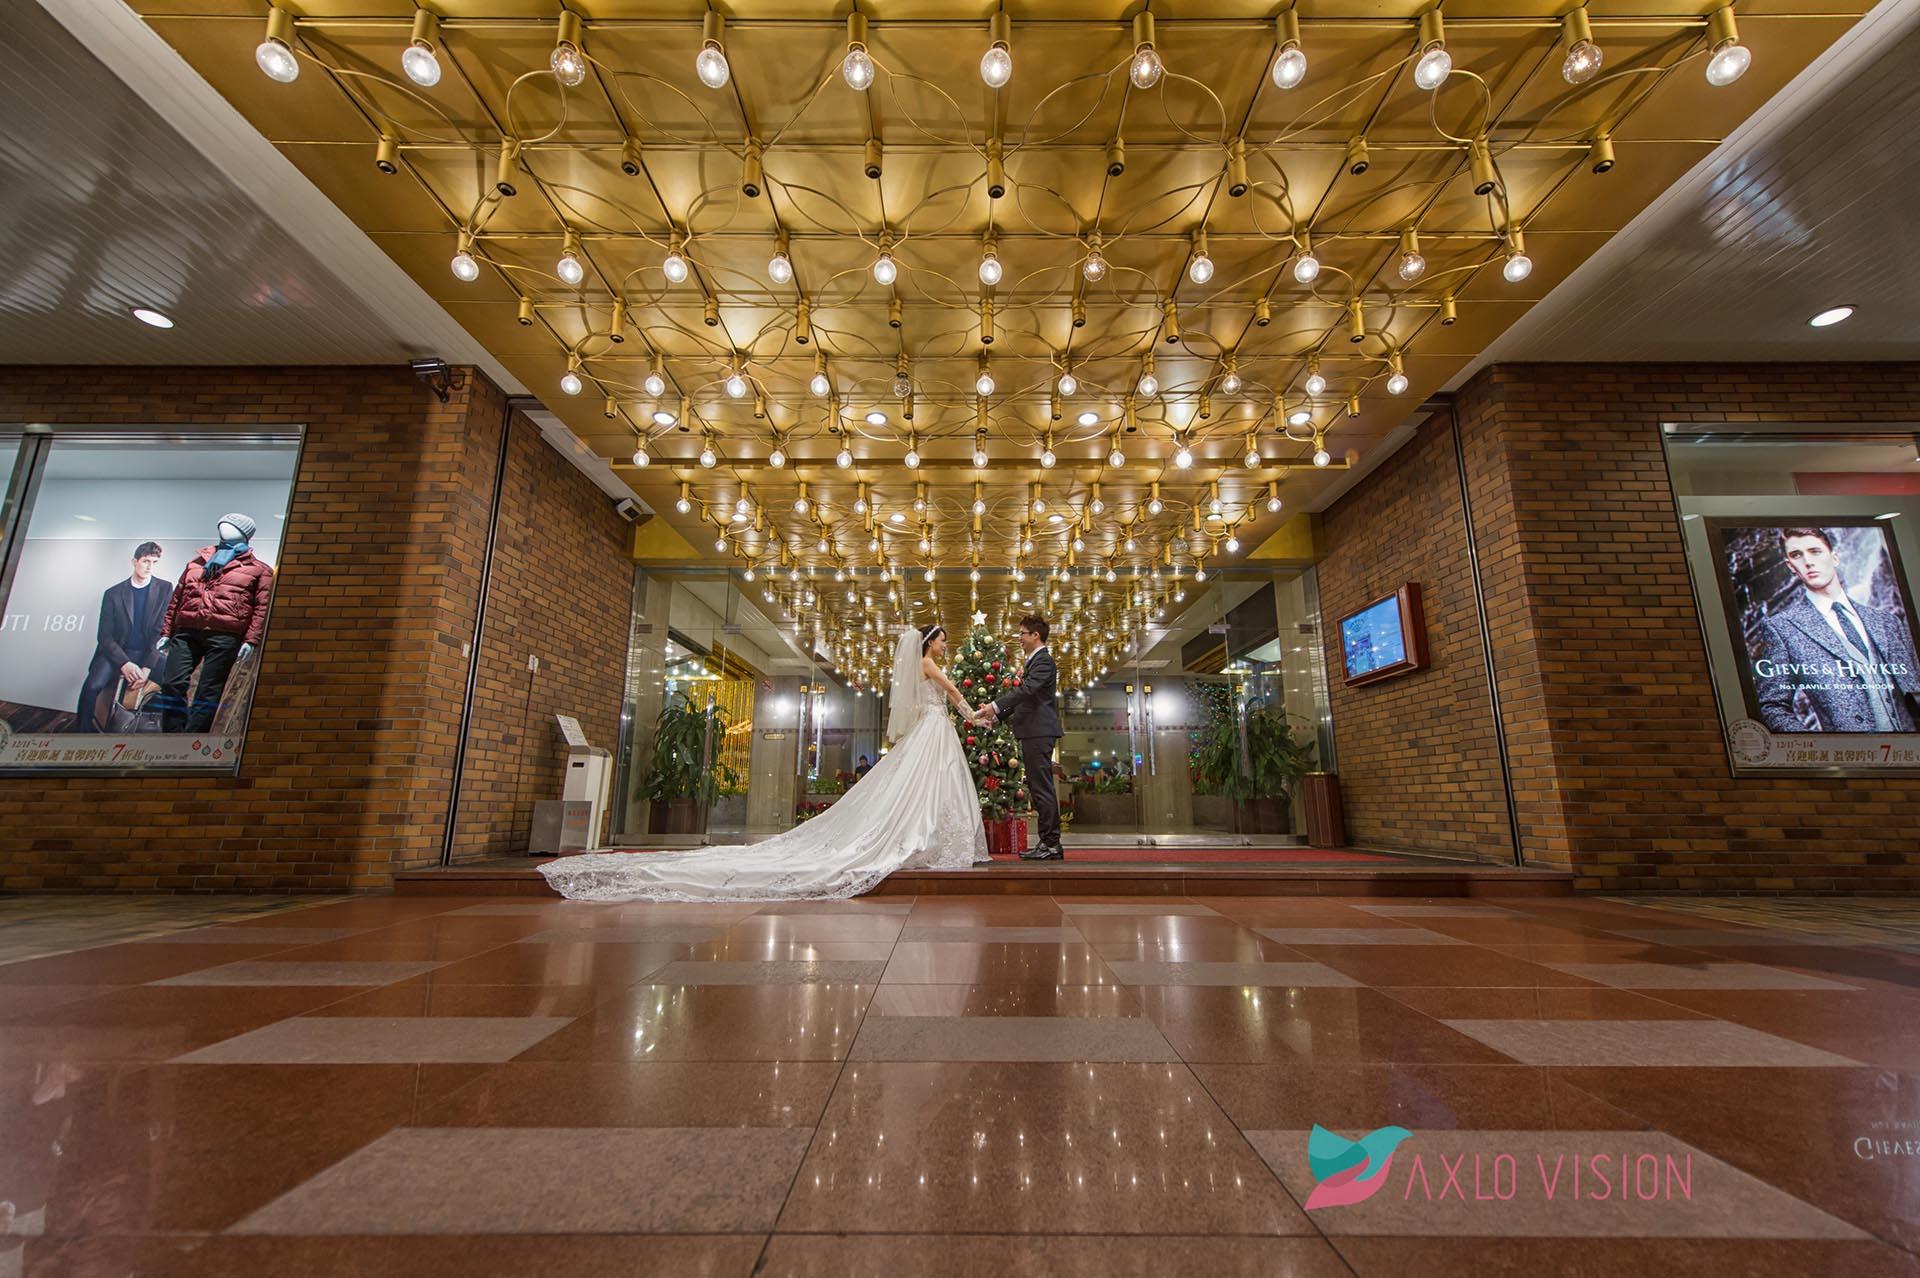 2017 AXLO web 首頁用 婚禮攝影_007